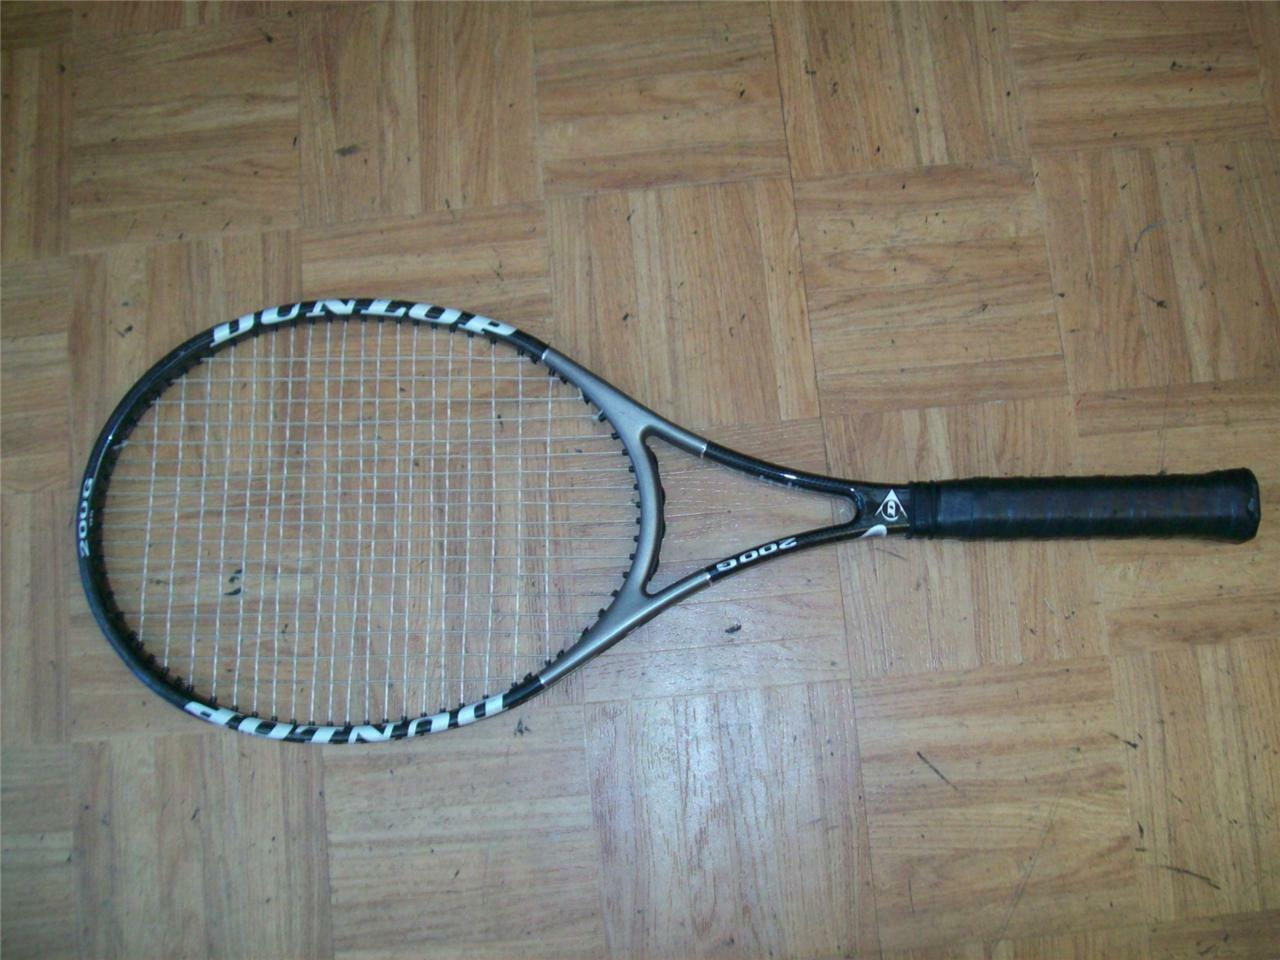 Dunlop Original Haas músculo Weave 200G 95 cabeza 18x20 4 3 8 Grip Tenis Raqueta